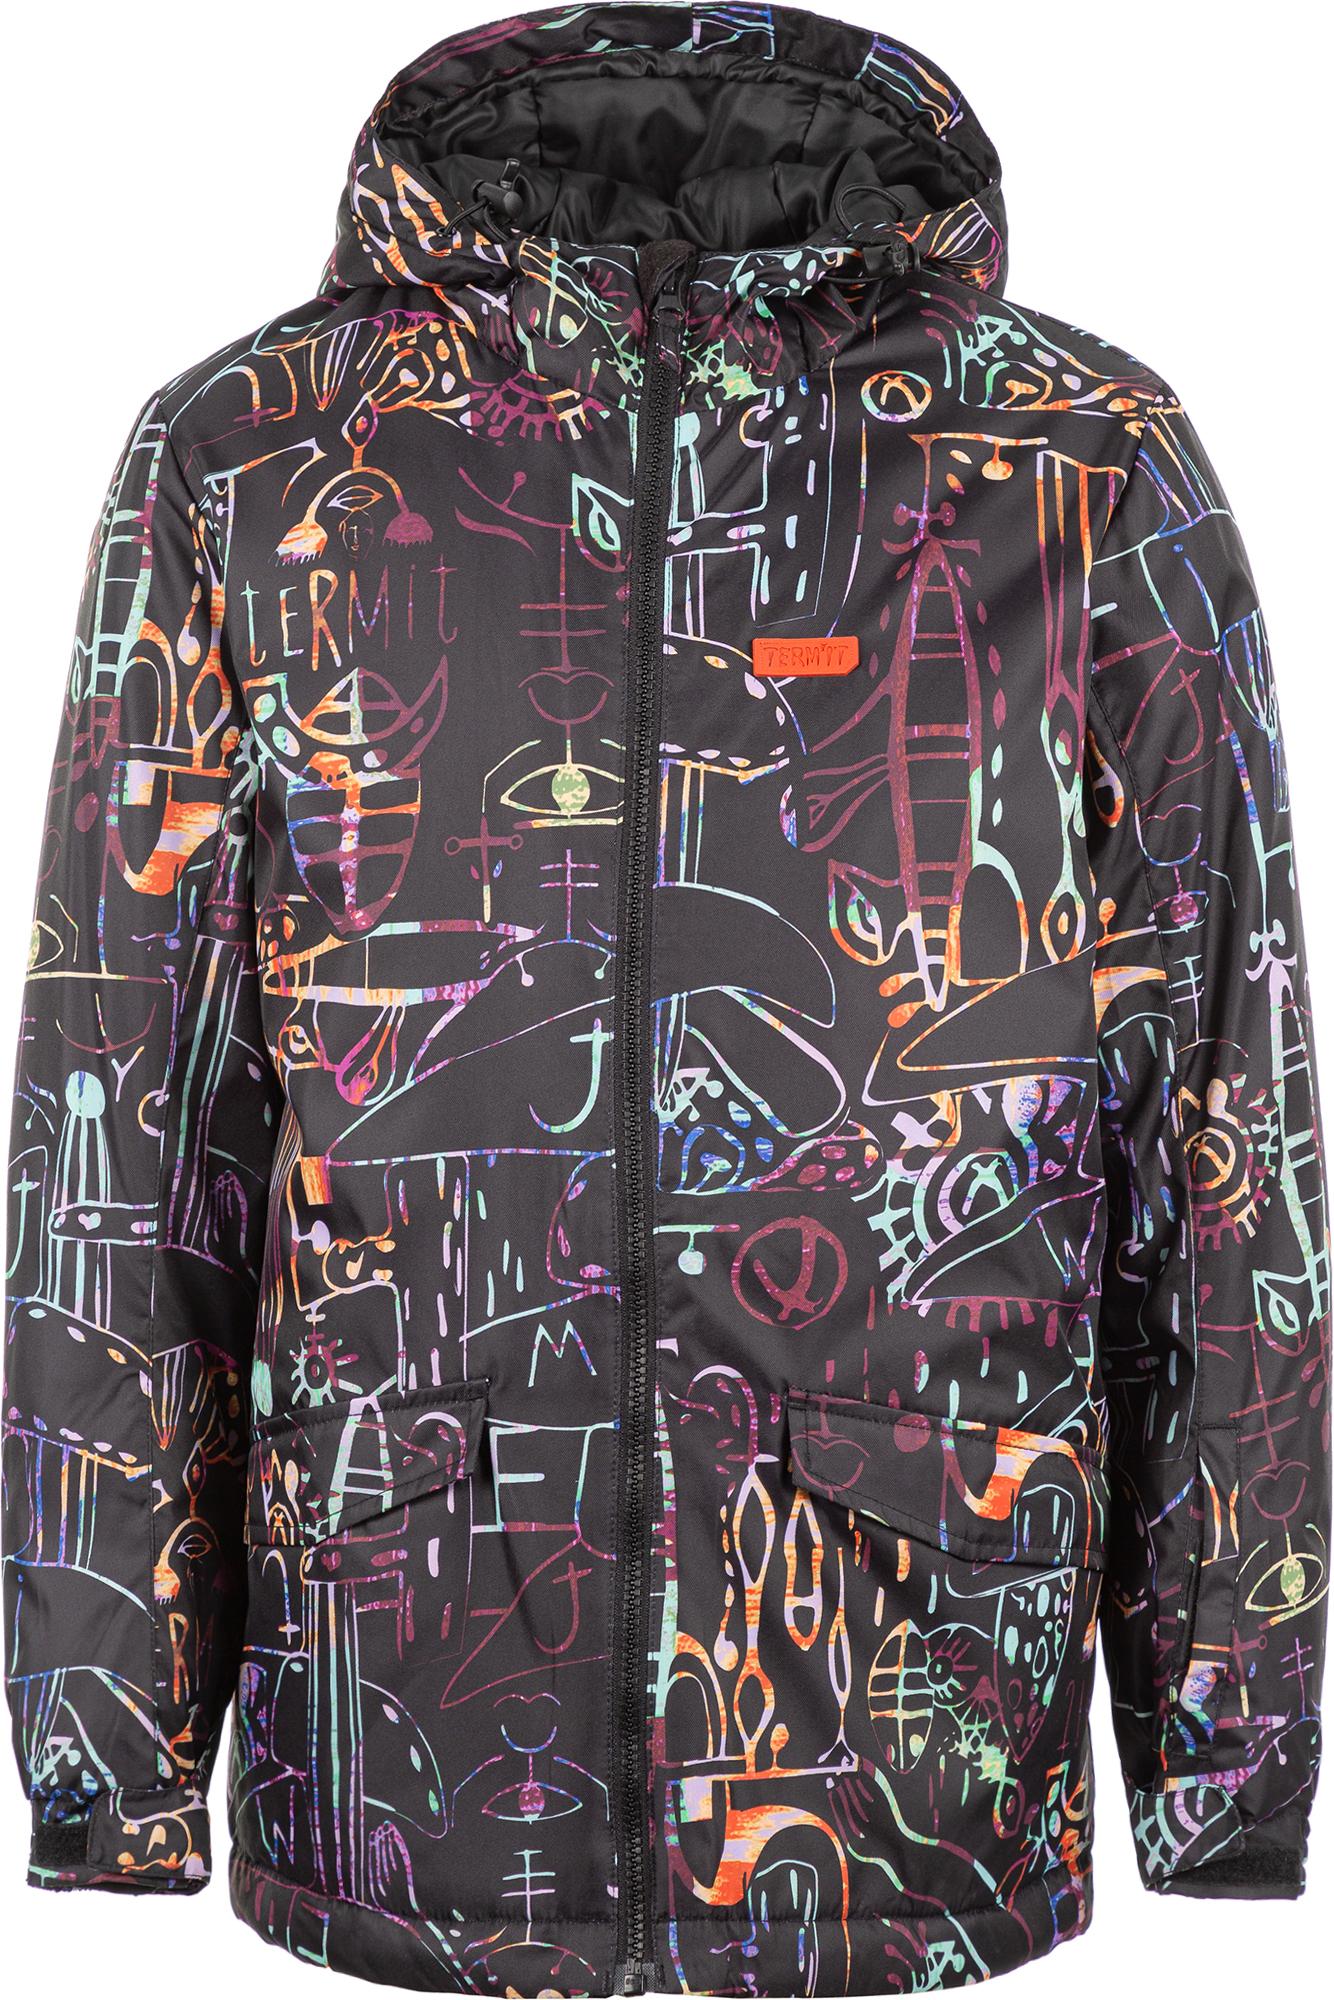 Termit Куртка утепленная для мальчиков Termit, размер 164 termit кеды для мальчиков termit keddo air размер 30